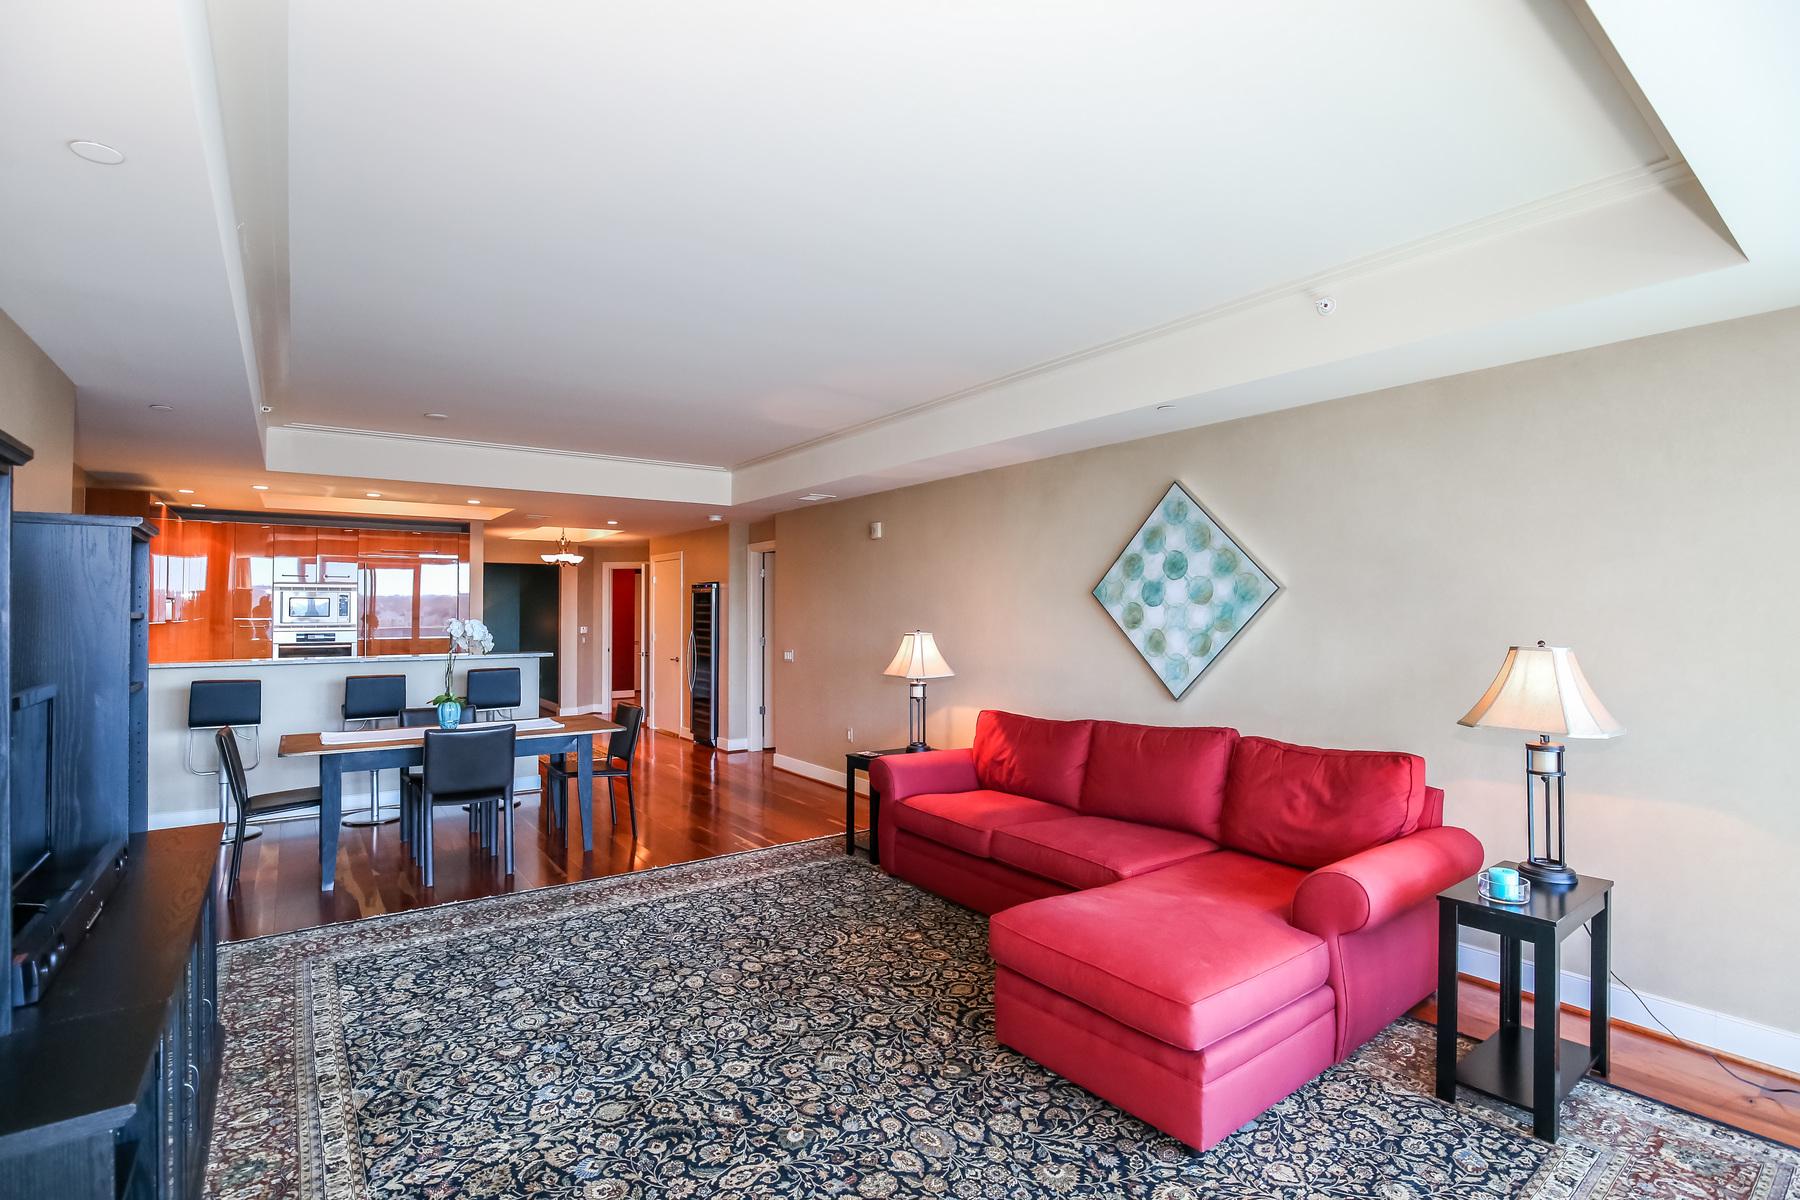 Additional photo for property listing at 1881 Nash Street N 1504, Arlington  Arlington, Virginia 22209 États-Unis